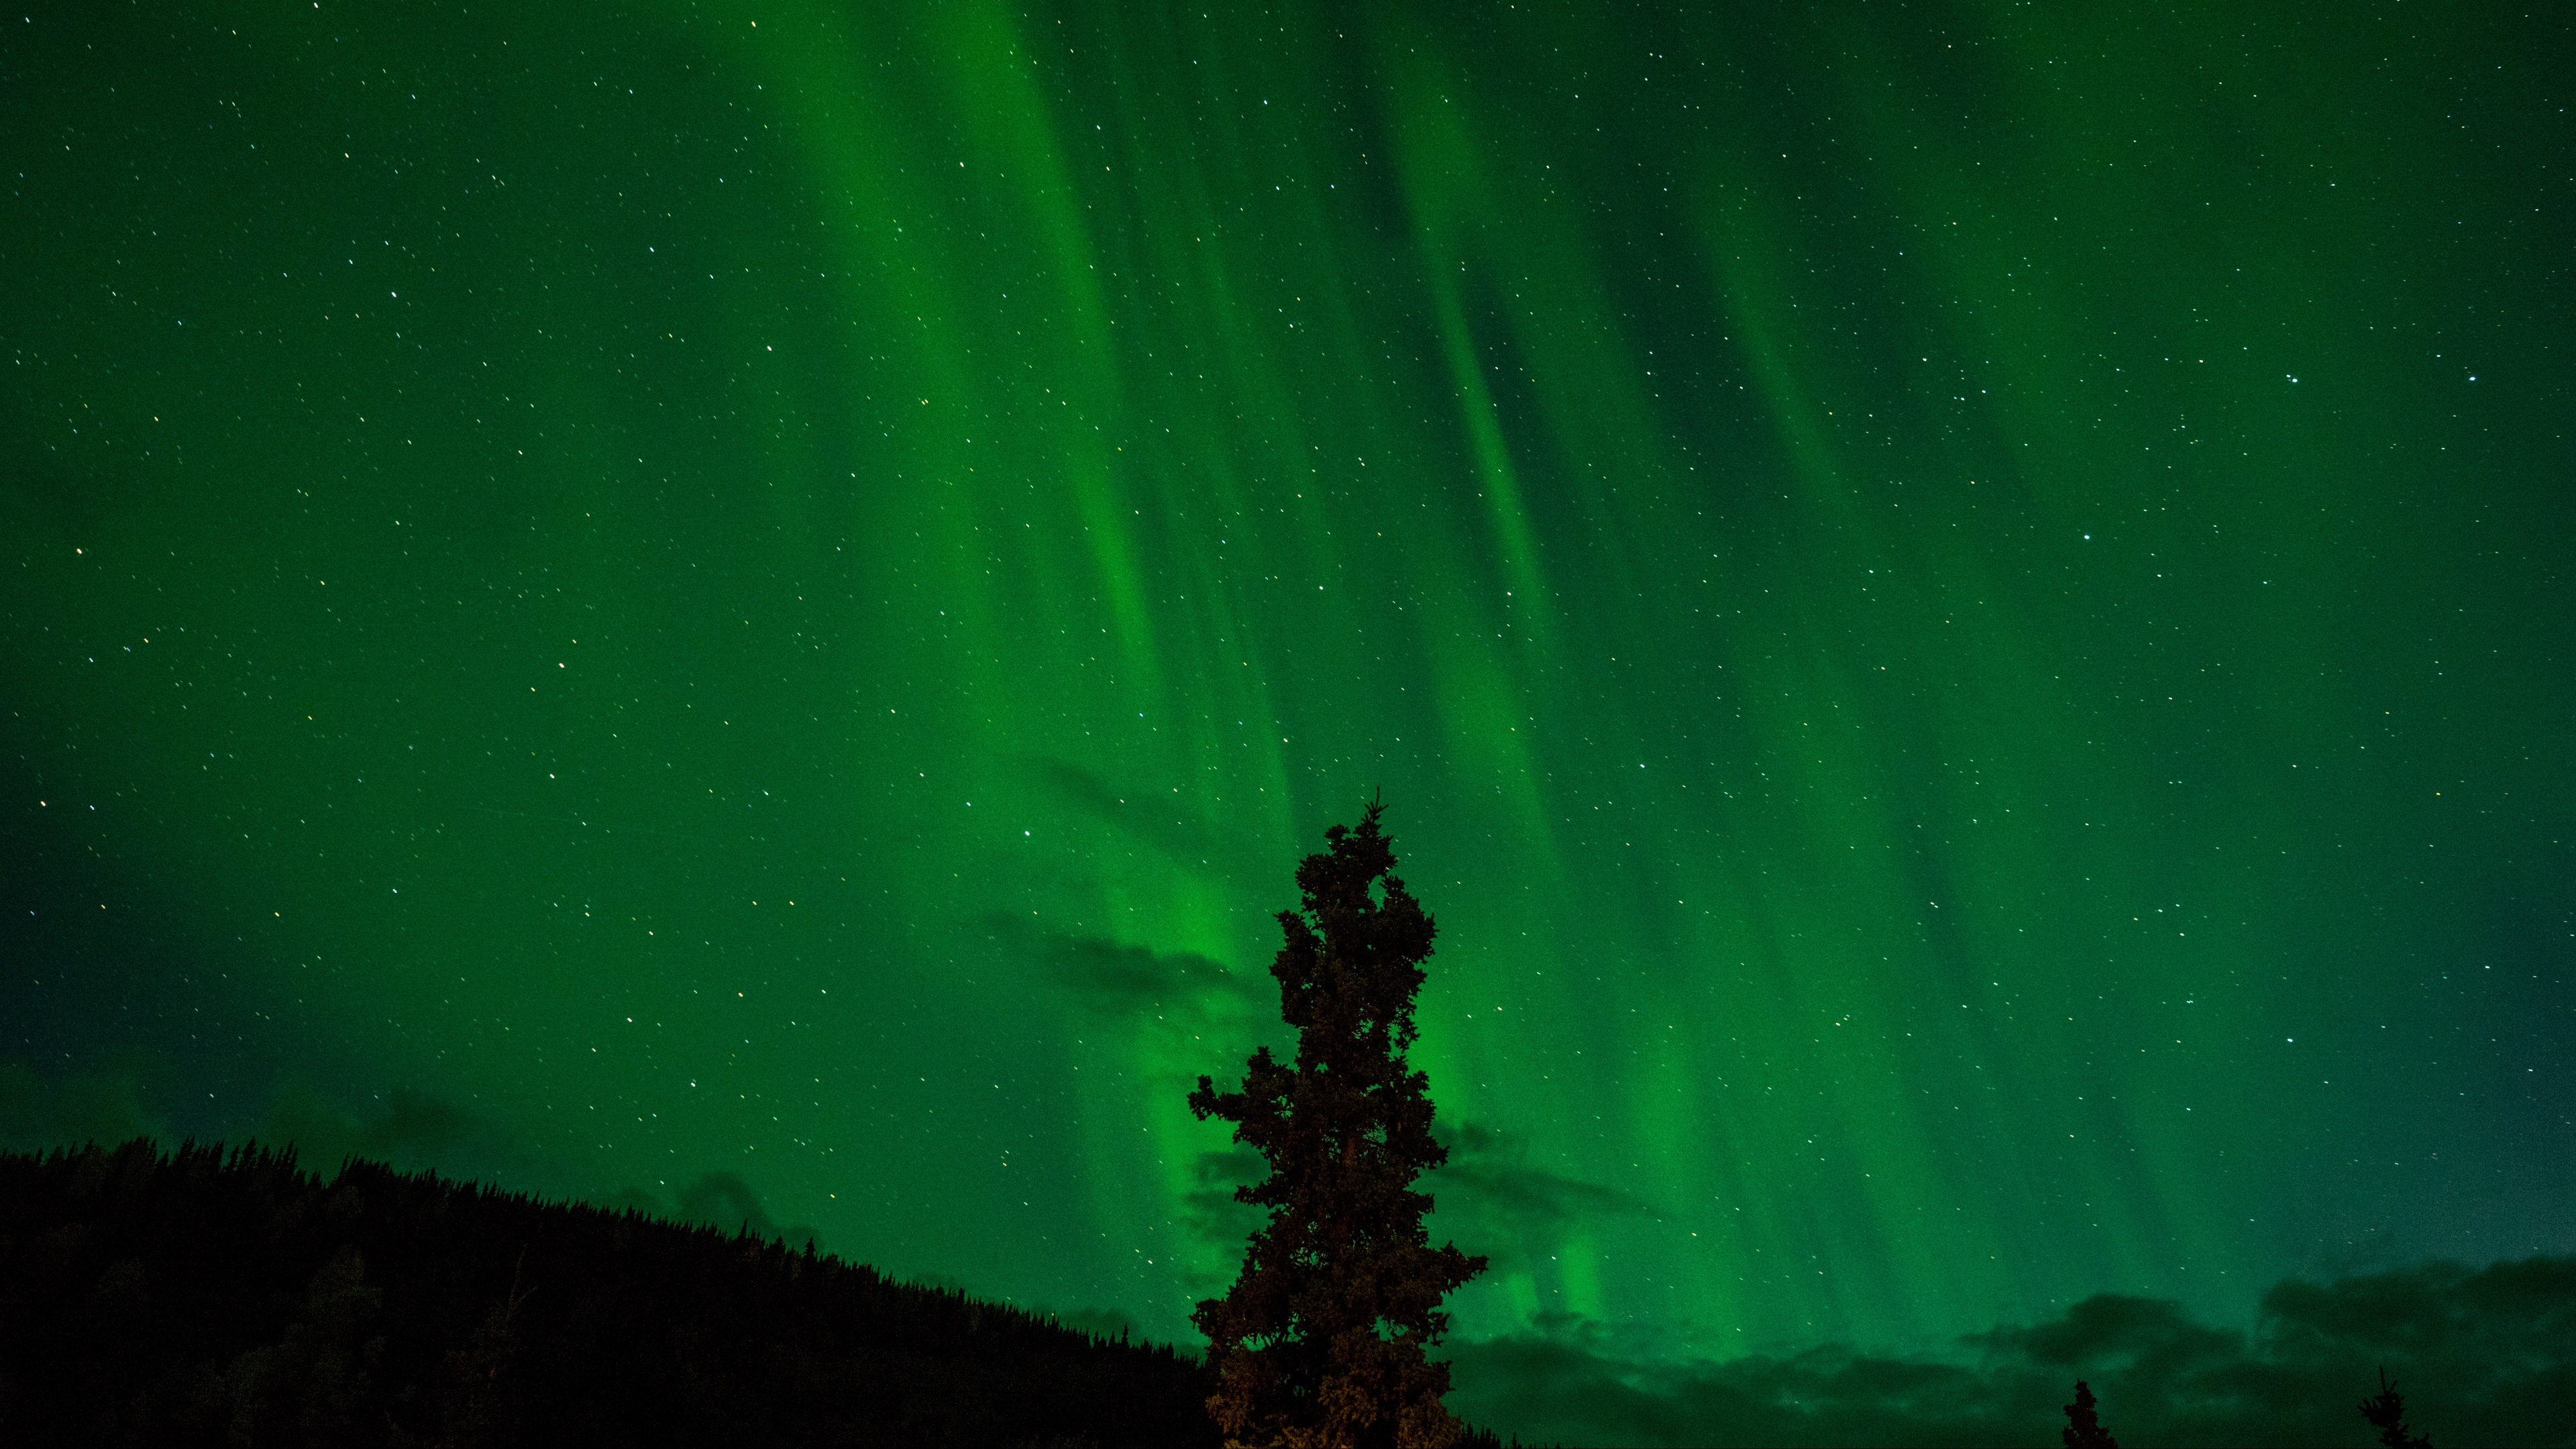 tree night sky starry sky radiance 4k 1536016903 - tree, night sky, starry sky, radiance 4k - tree, starry sky, night sky